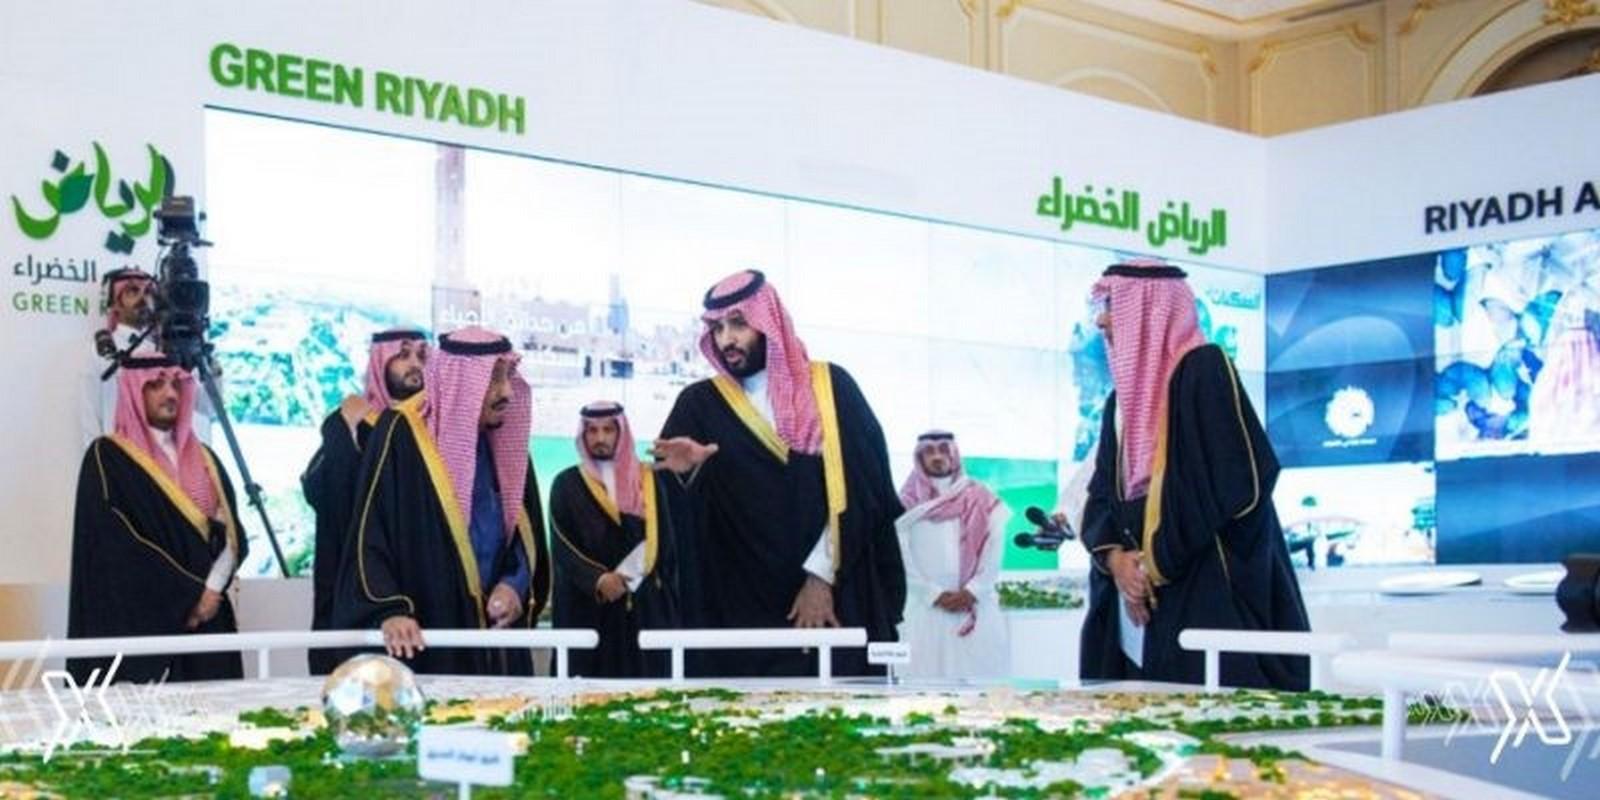 Sustainable architecture in Saudi Arabia - Sheet5